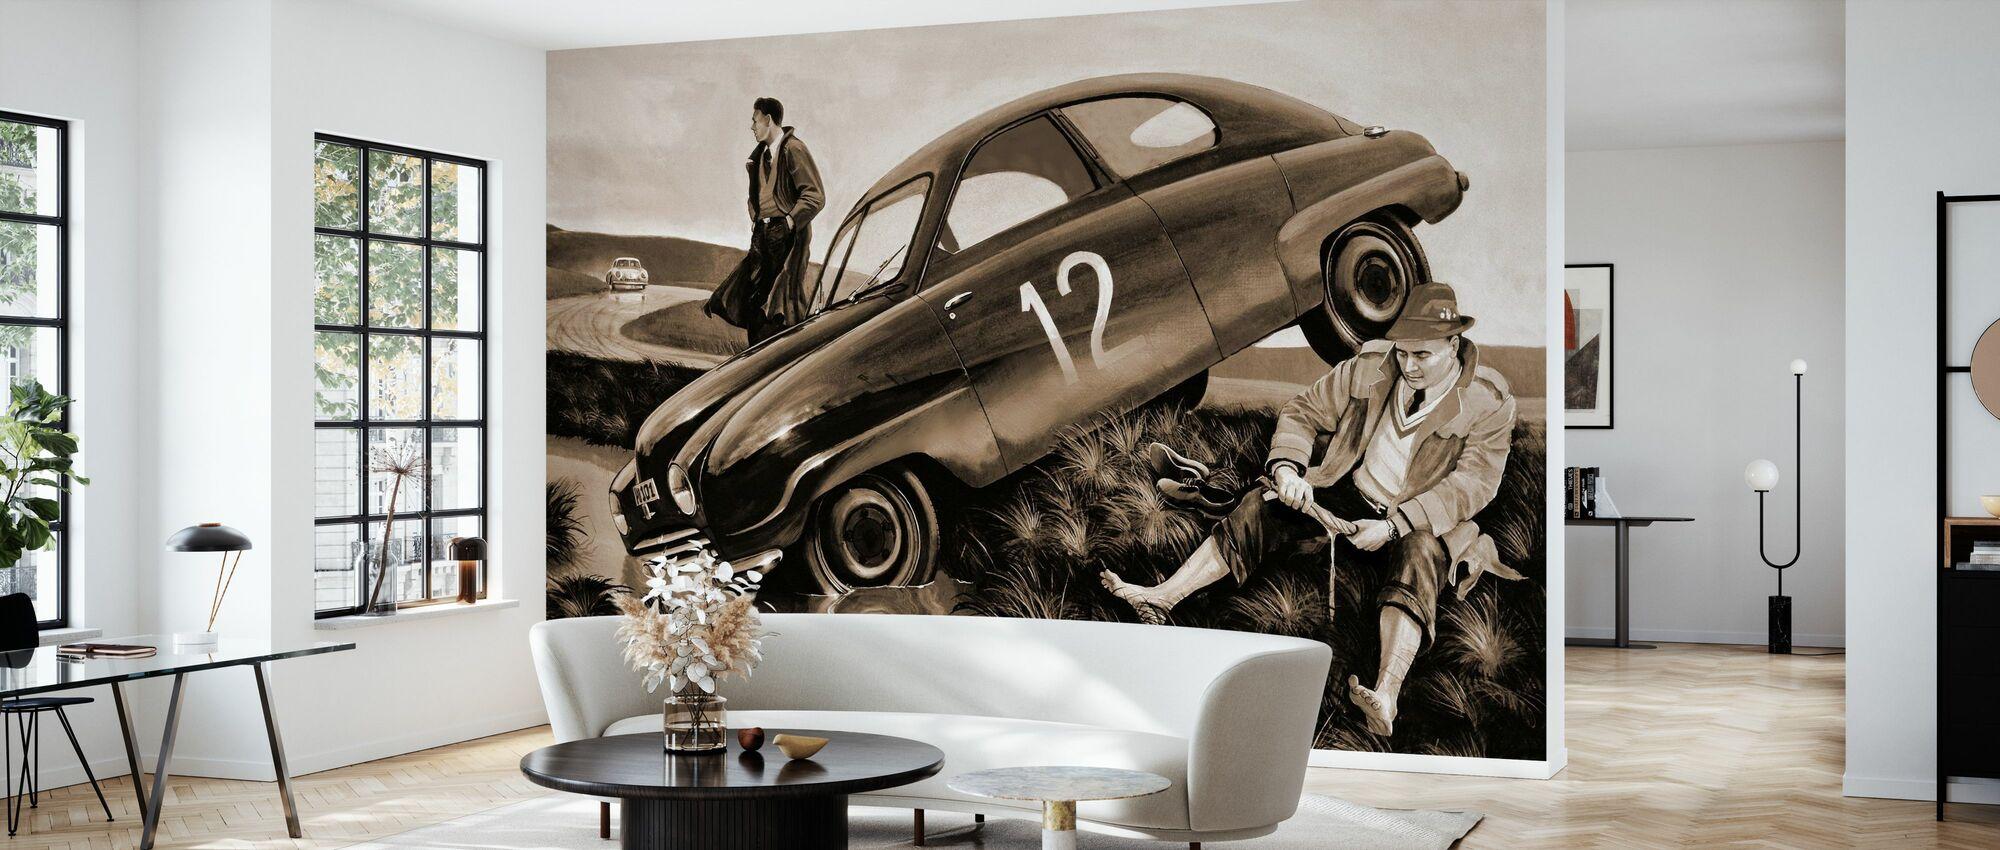 Carlsson Car Sepia - Wallpaper - Living Room